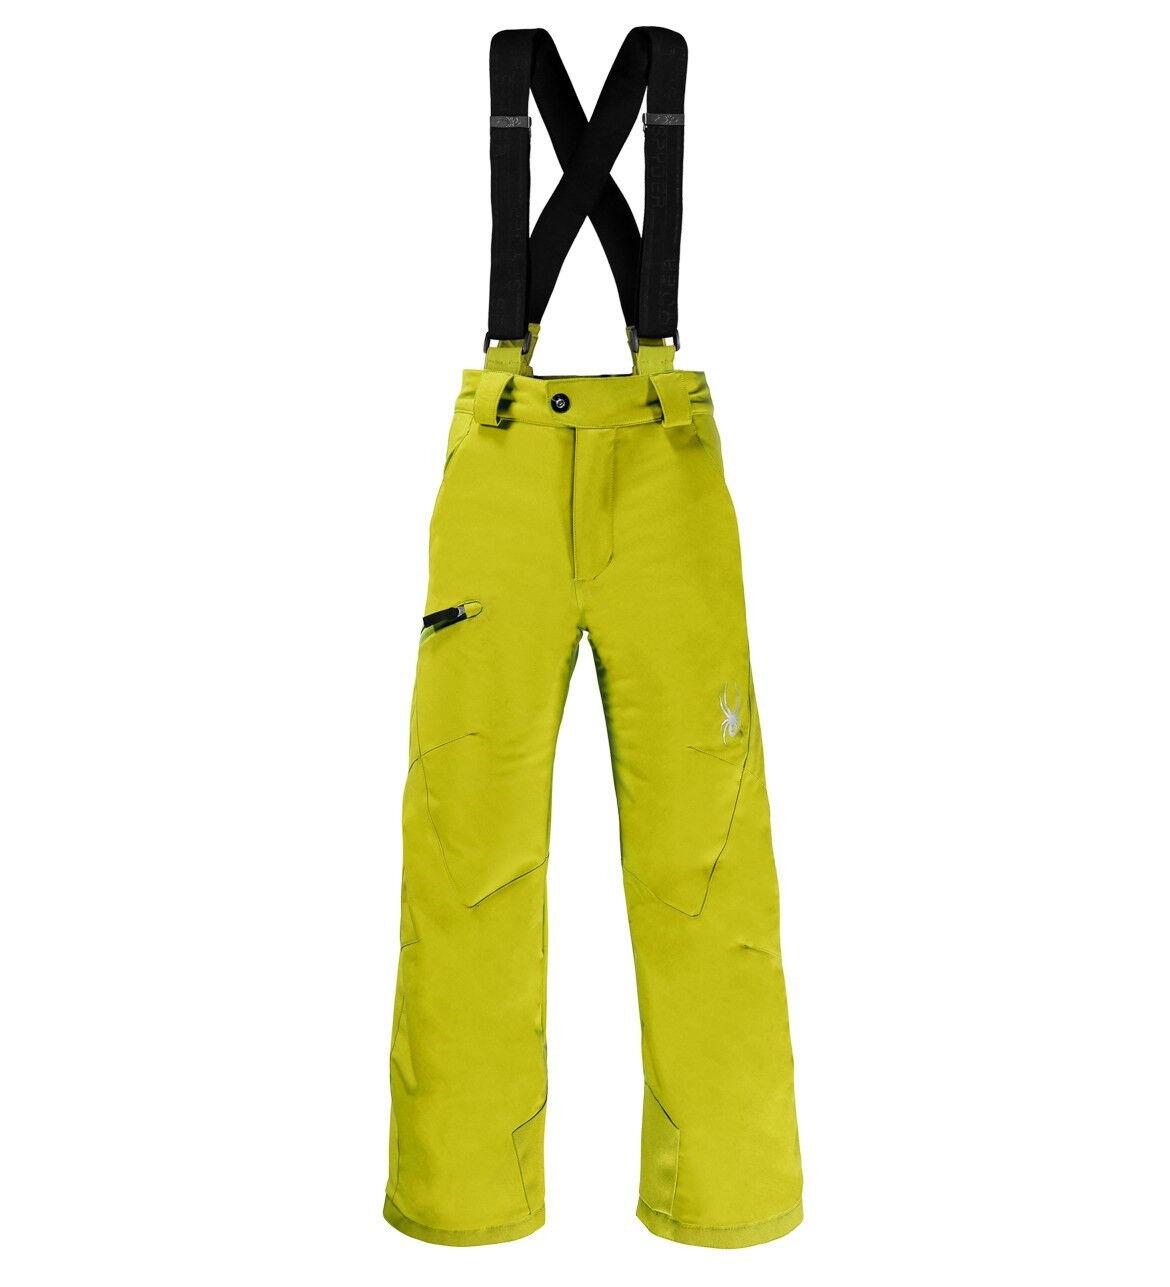 NEW Spyder Propulsion Ski Hose Insulated Waterproof Sulfur Boy's 8